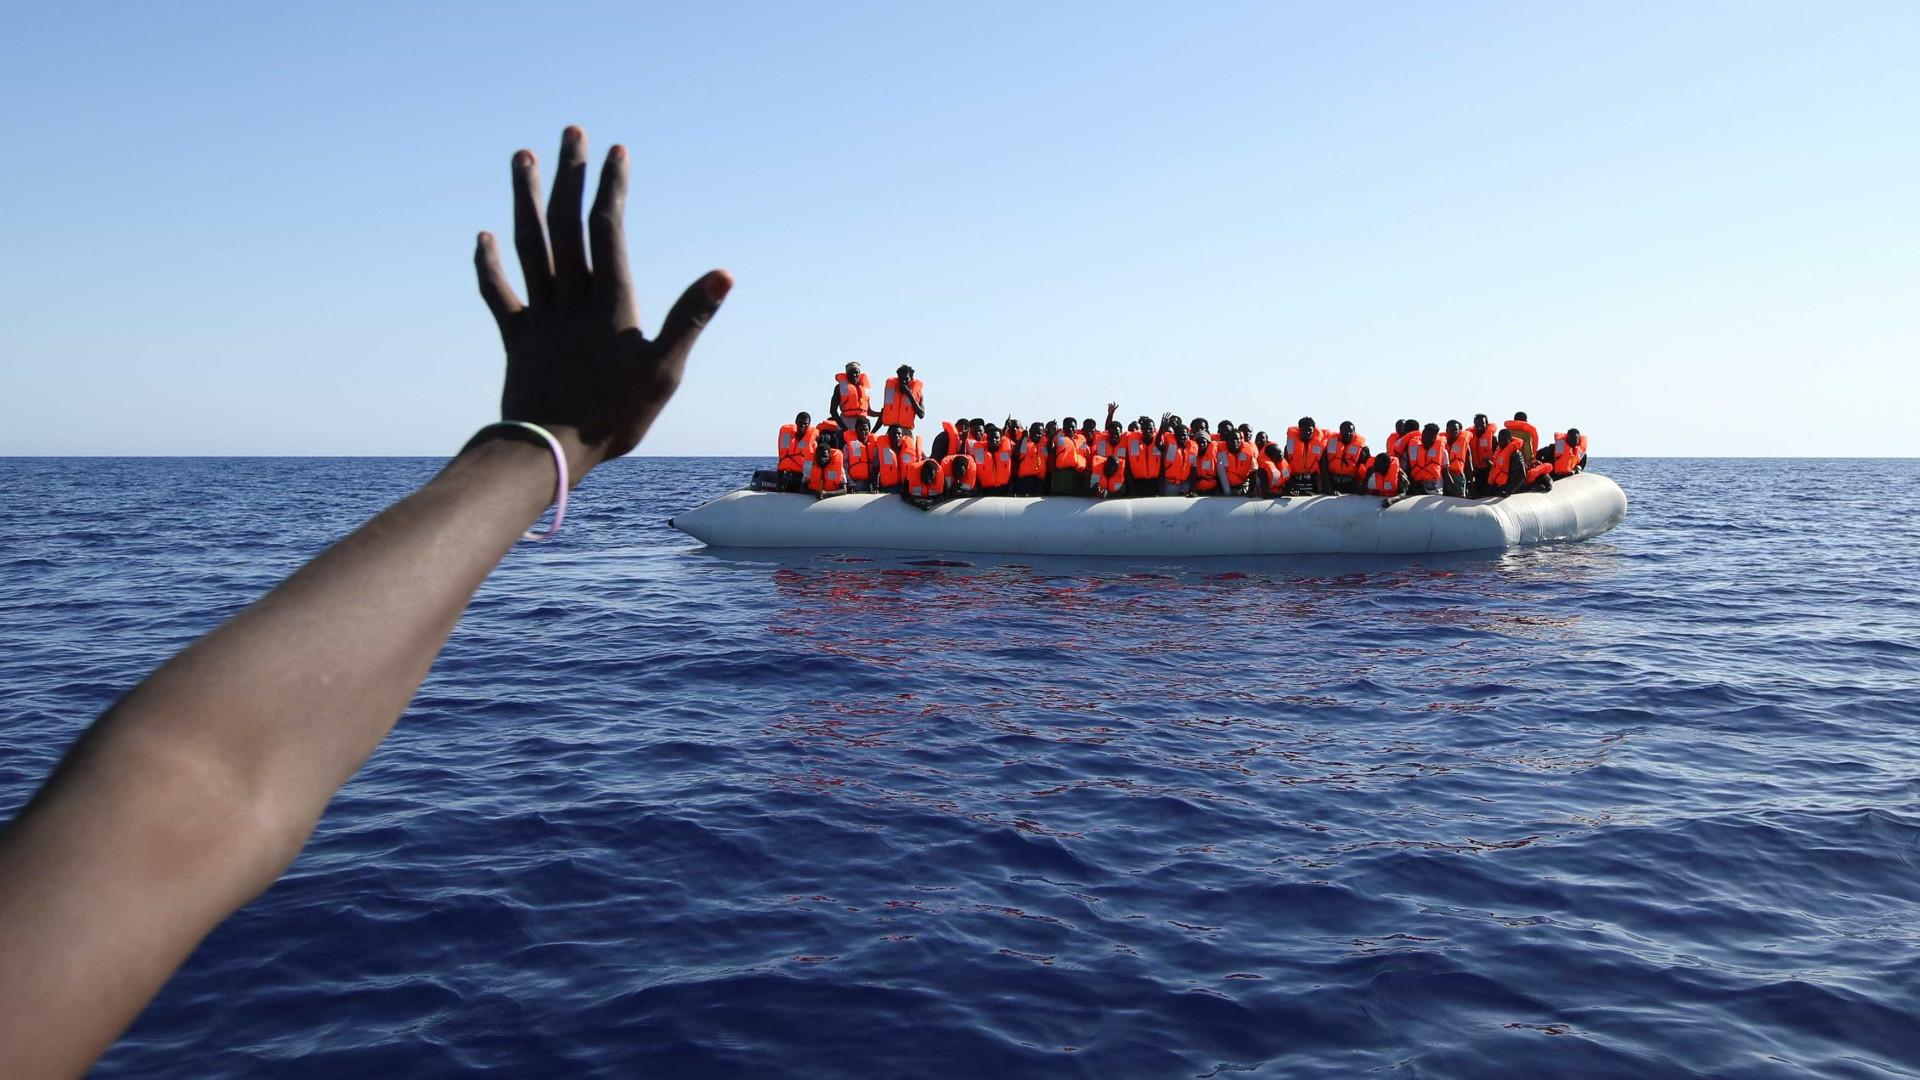 Itália resgata 70 migrantes no Mar Mediterrâneo